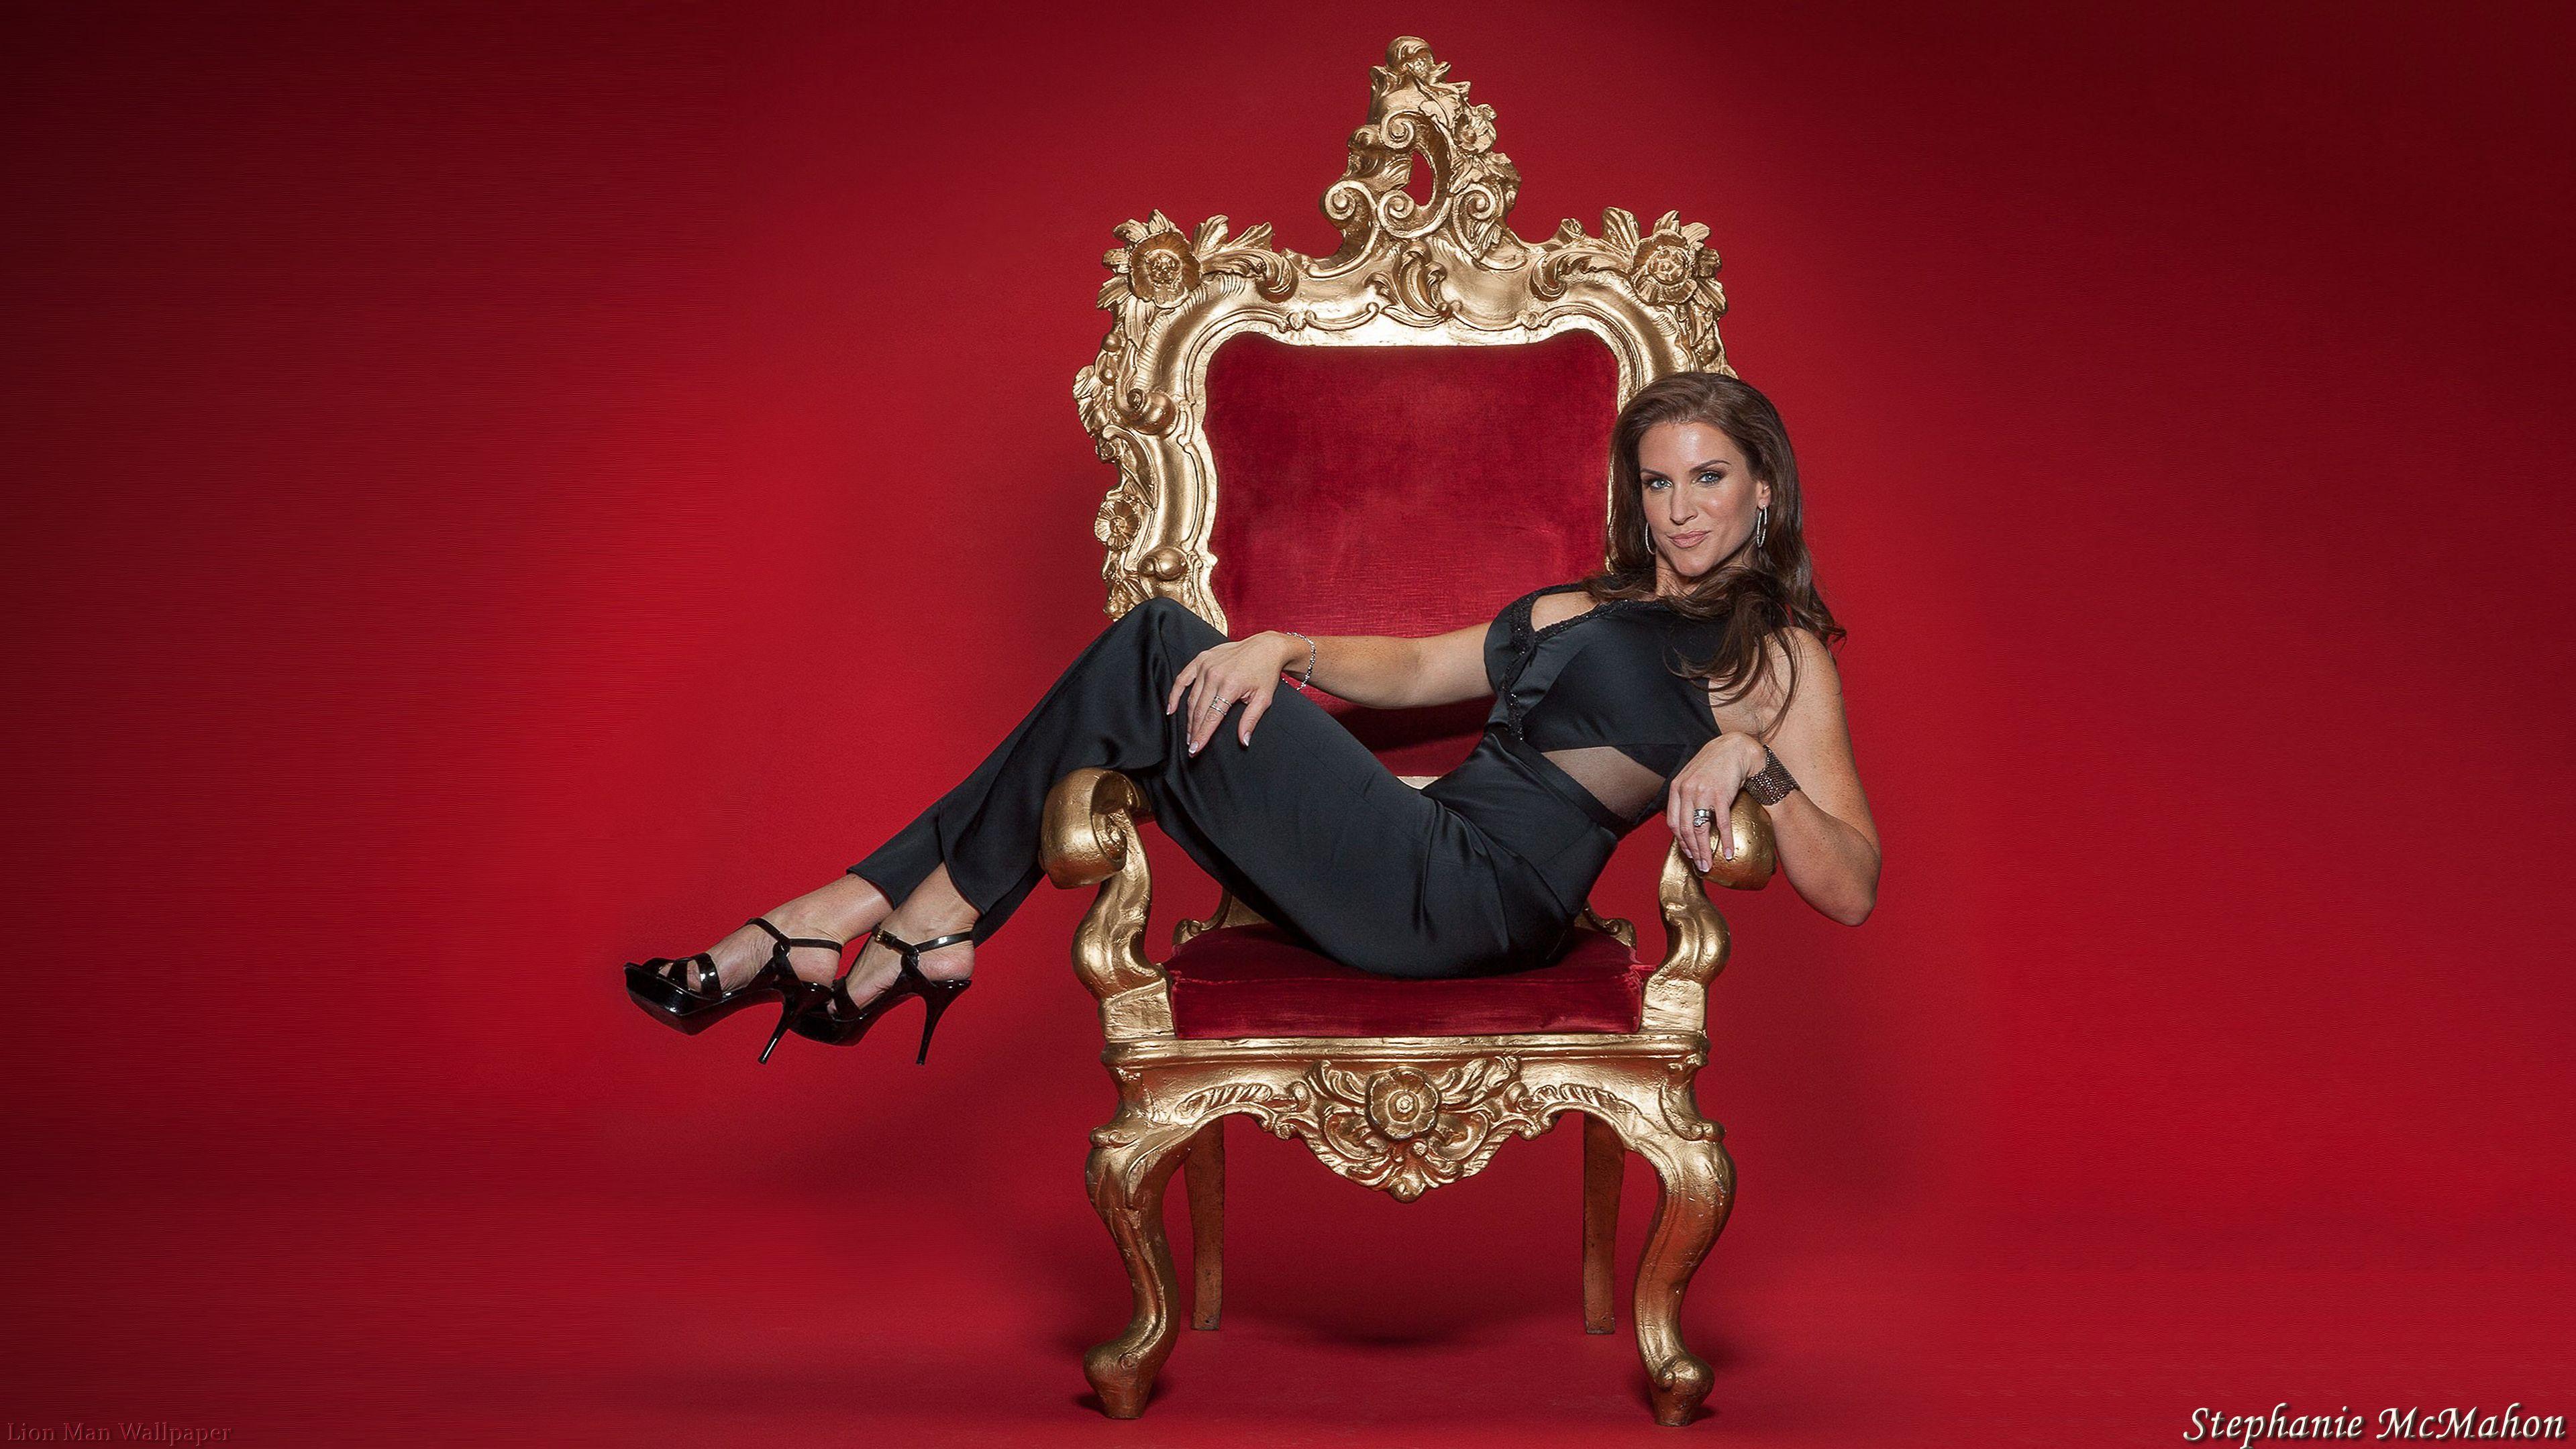 Stephanie McMahon in 2020 Divine feminine, Stephanie